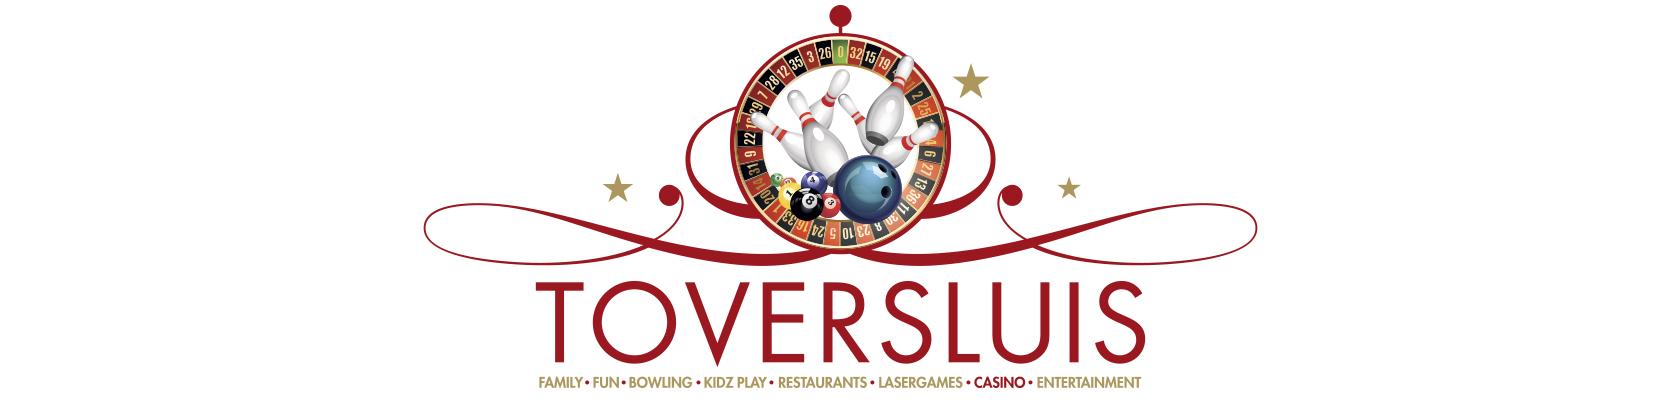 toversluis-slider-logo